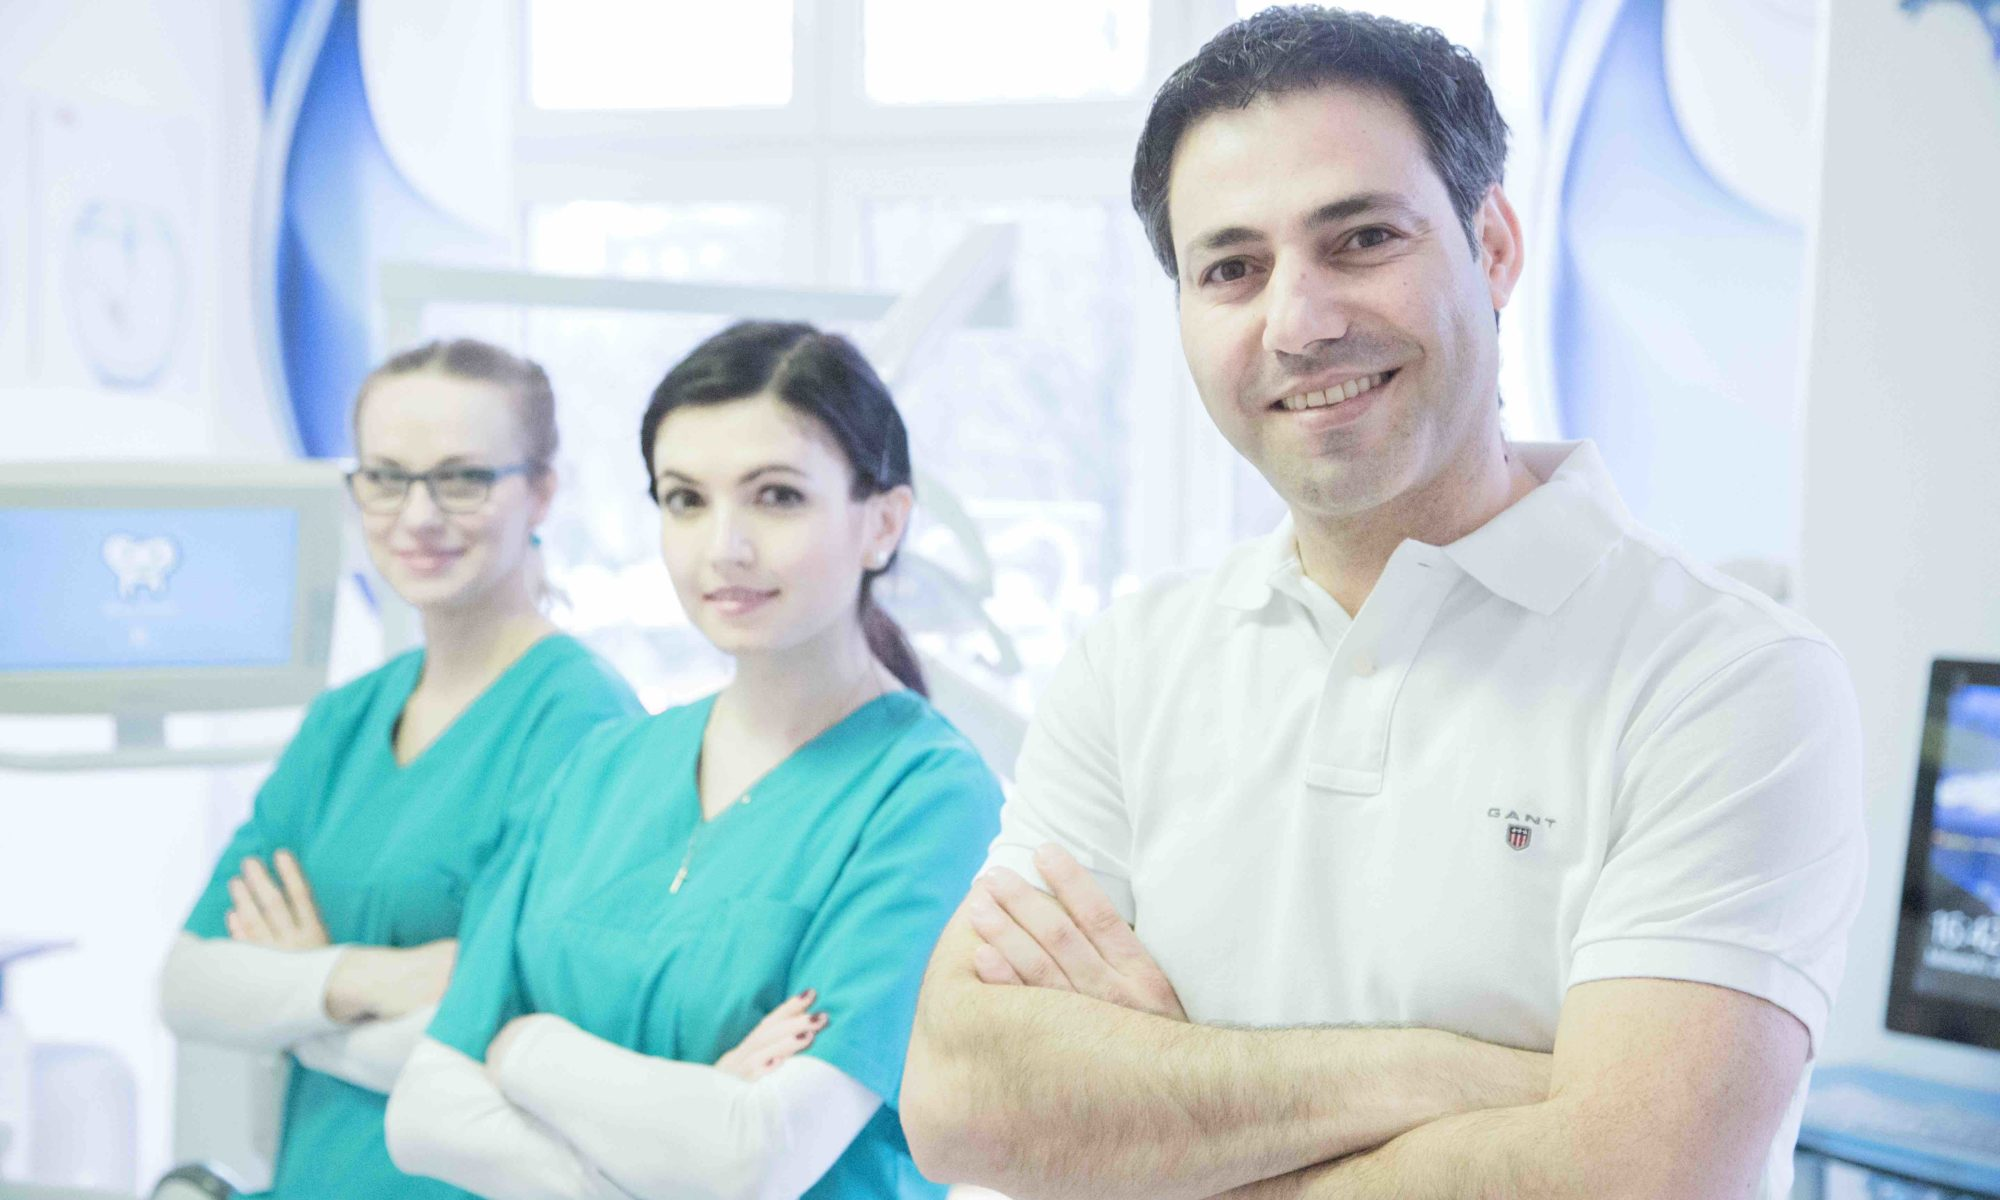 Zahnarztpraxis Hawar Kadro